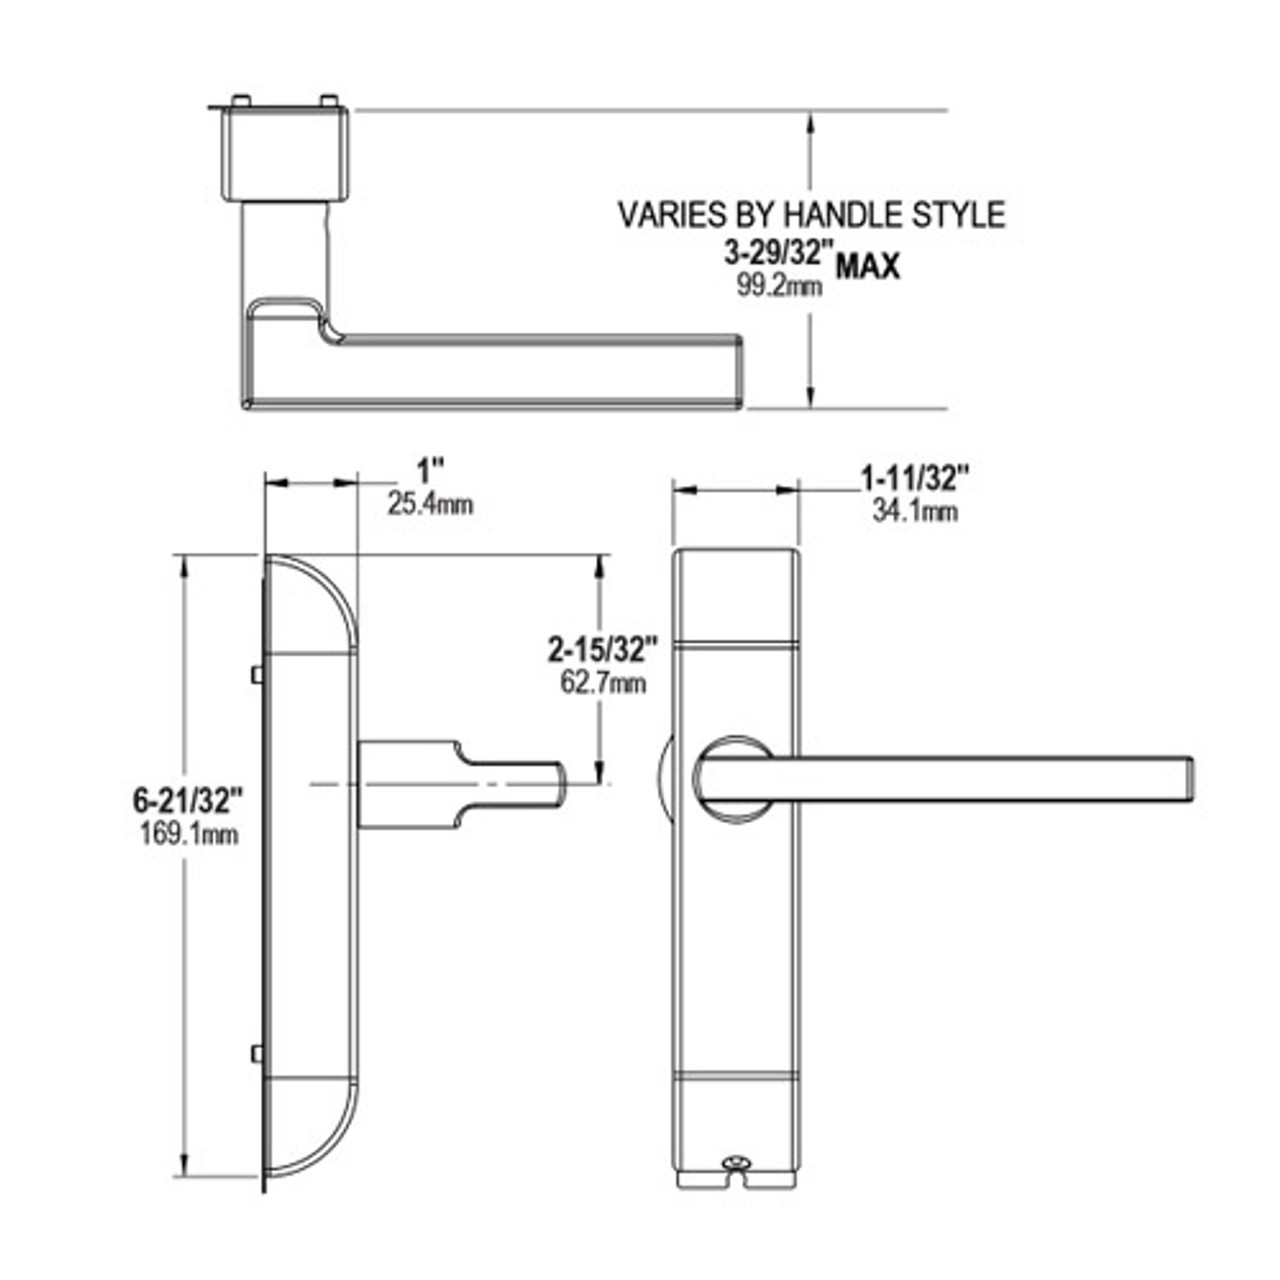 4600-MW-522-US10B Adams Rite MW Designer handle Dimensional View